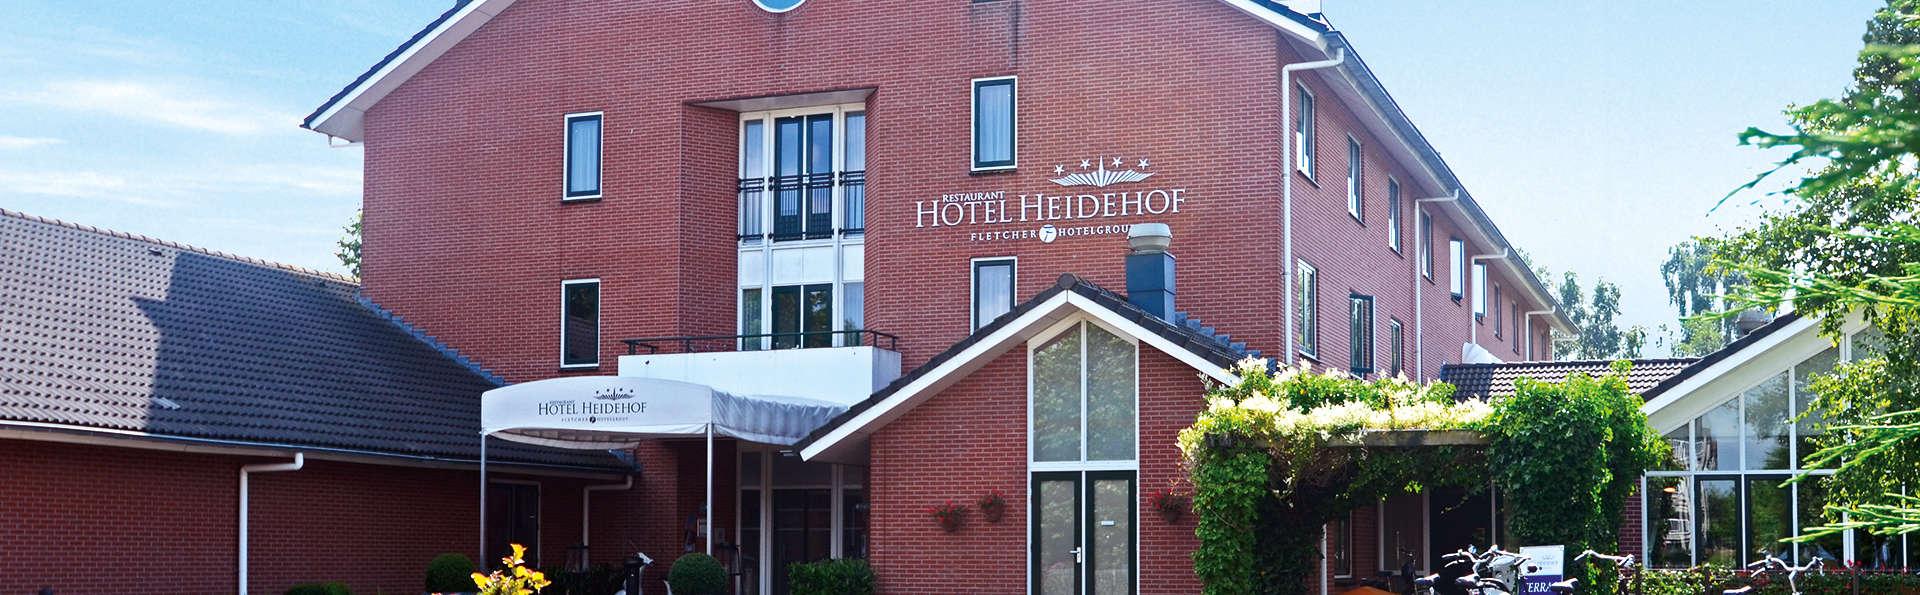 Fletcher Hotel-Restaurant Heidehof - Edit_Front2.jpg